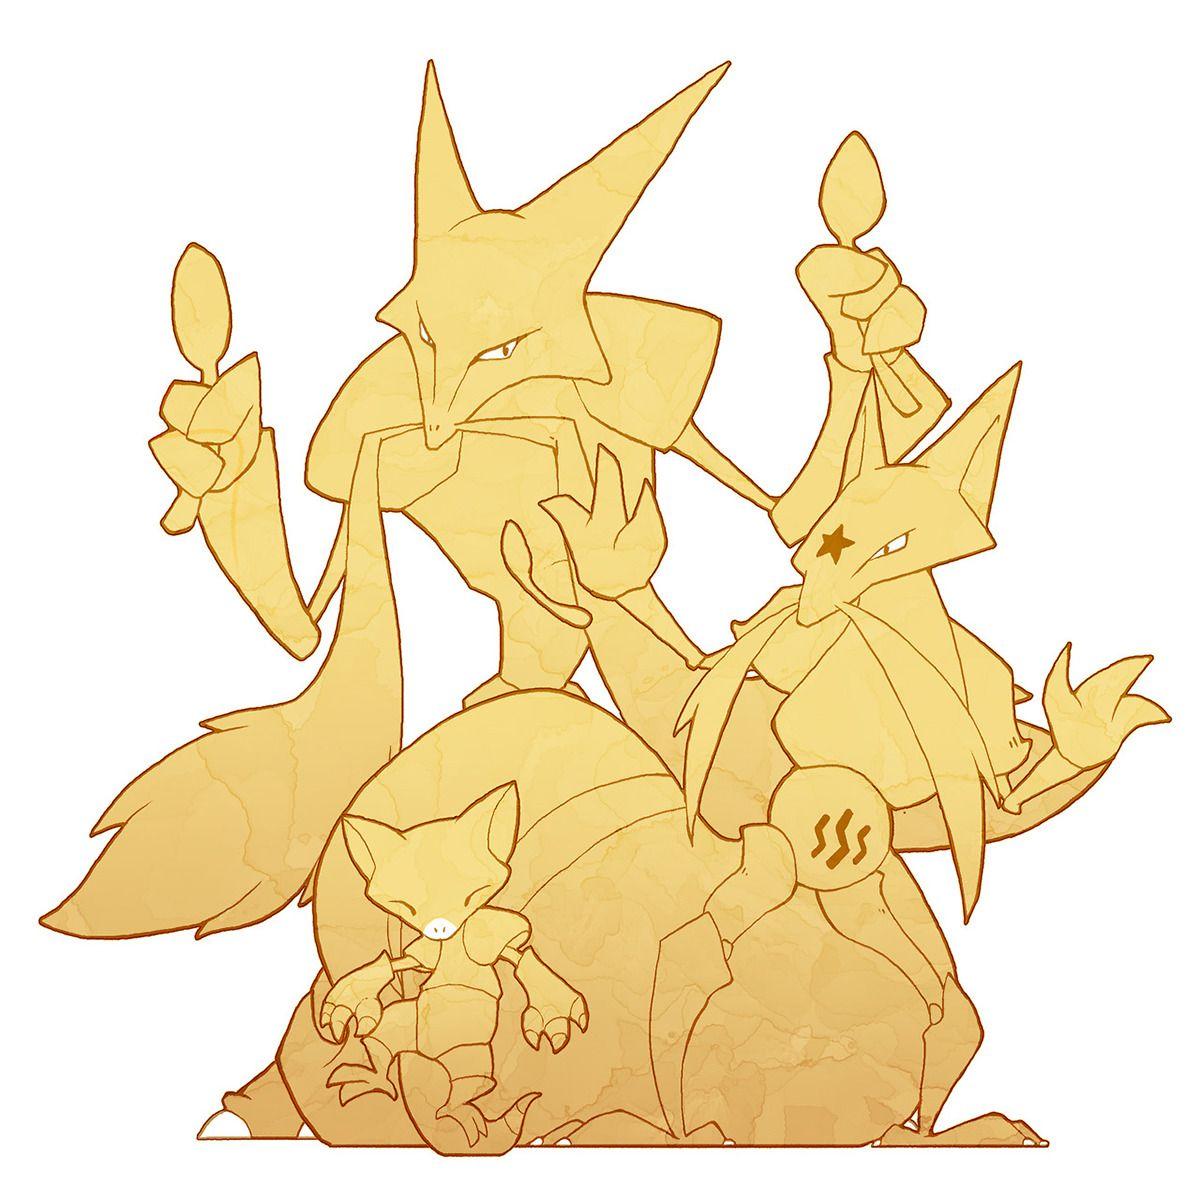 Daily Pokemon on Behance